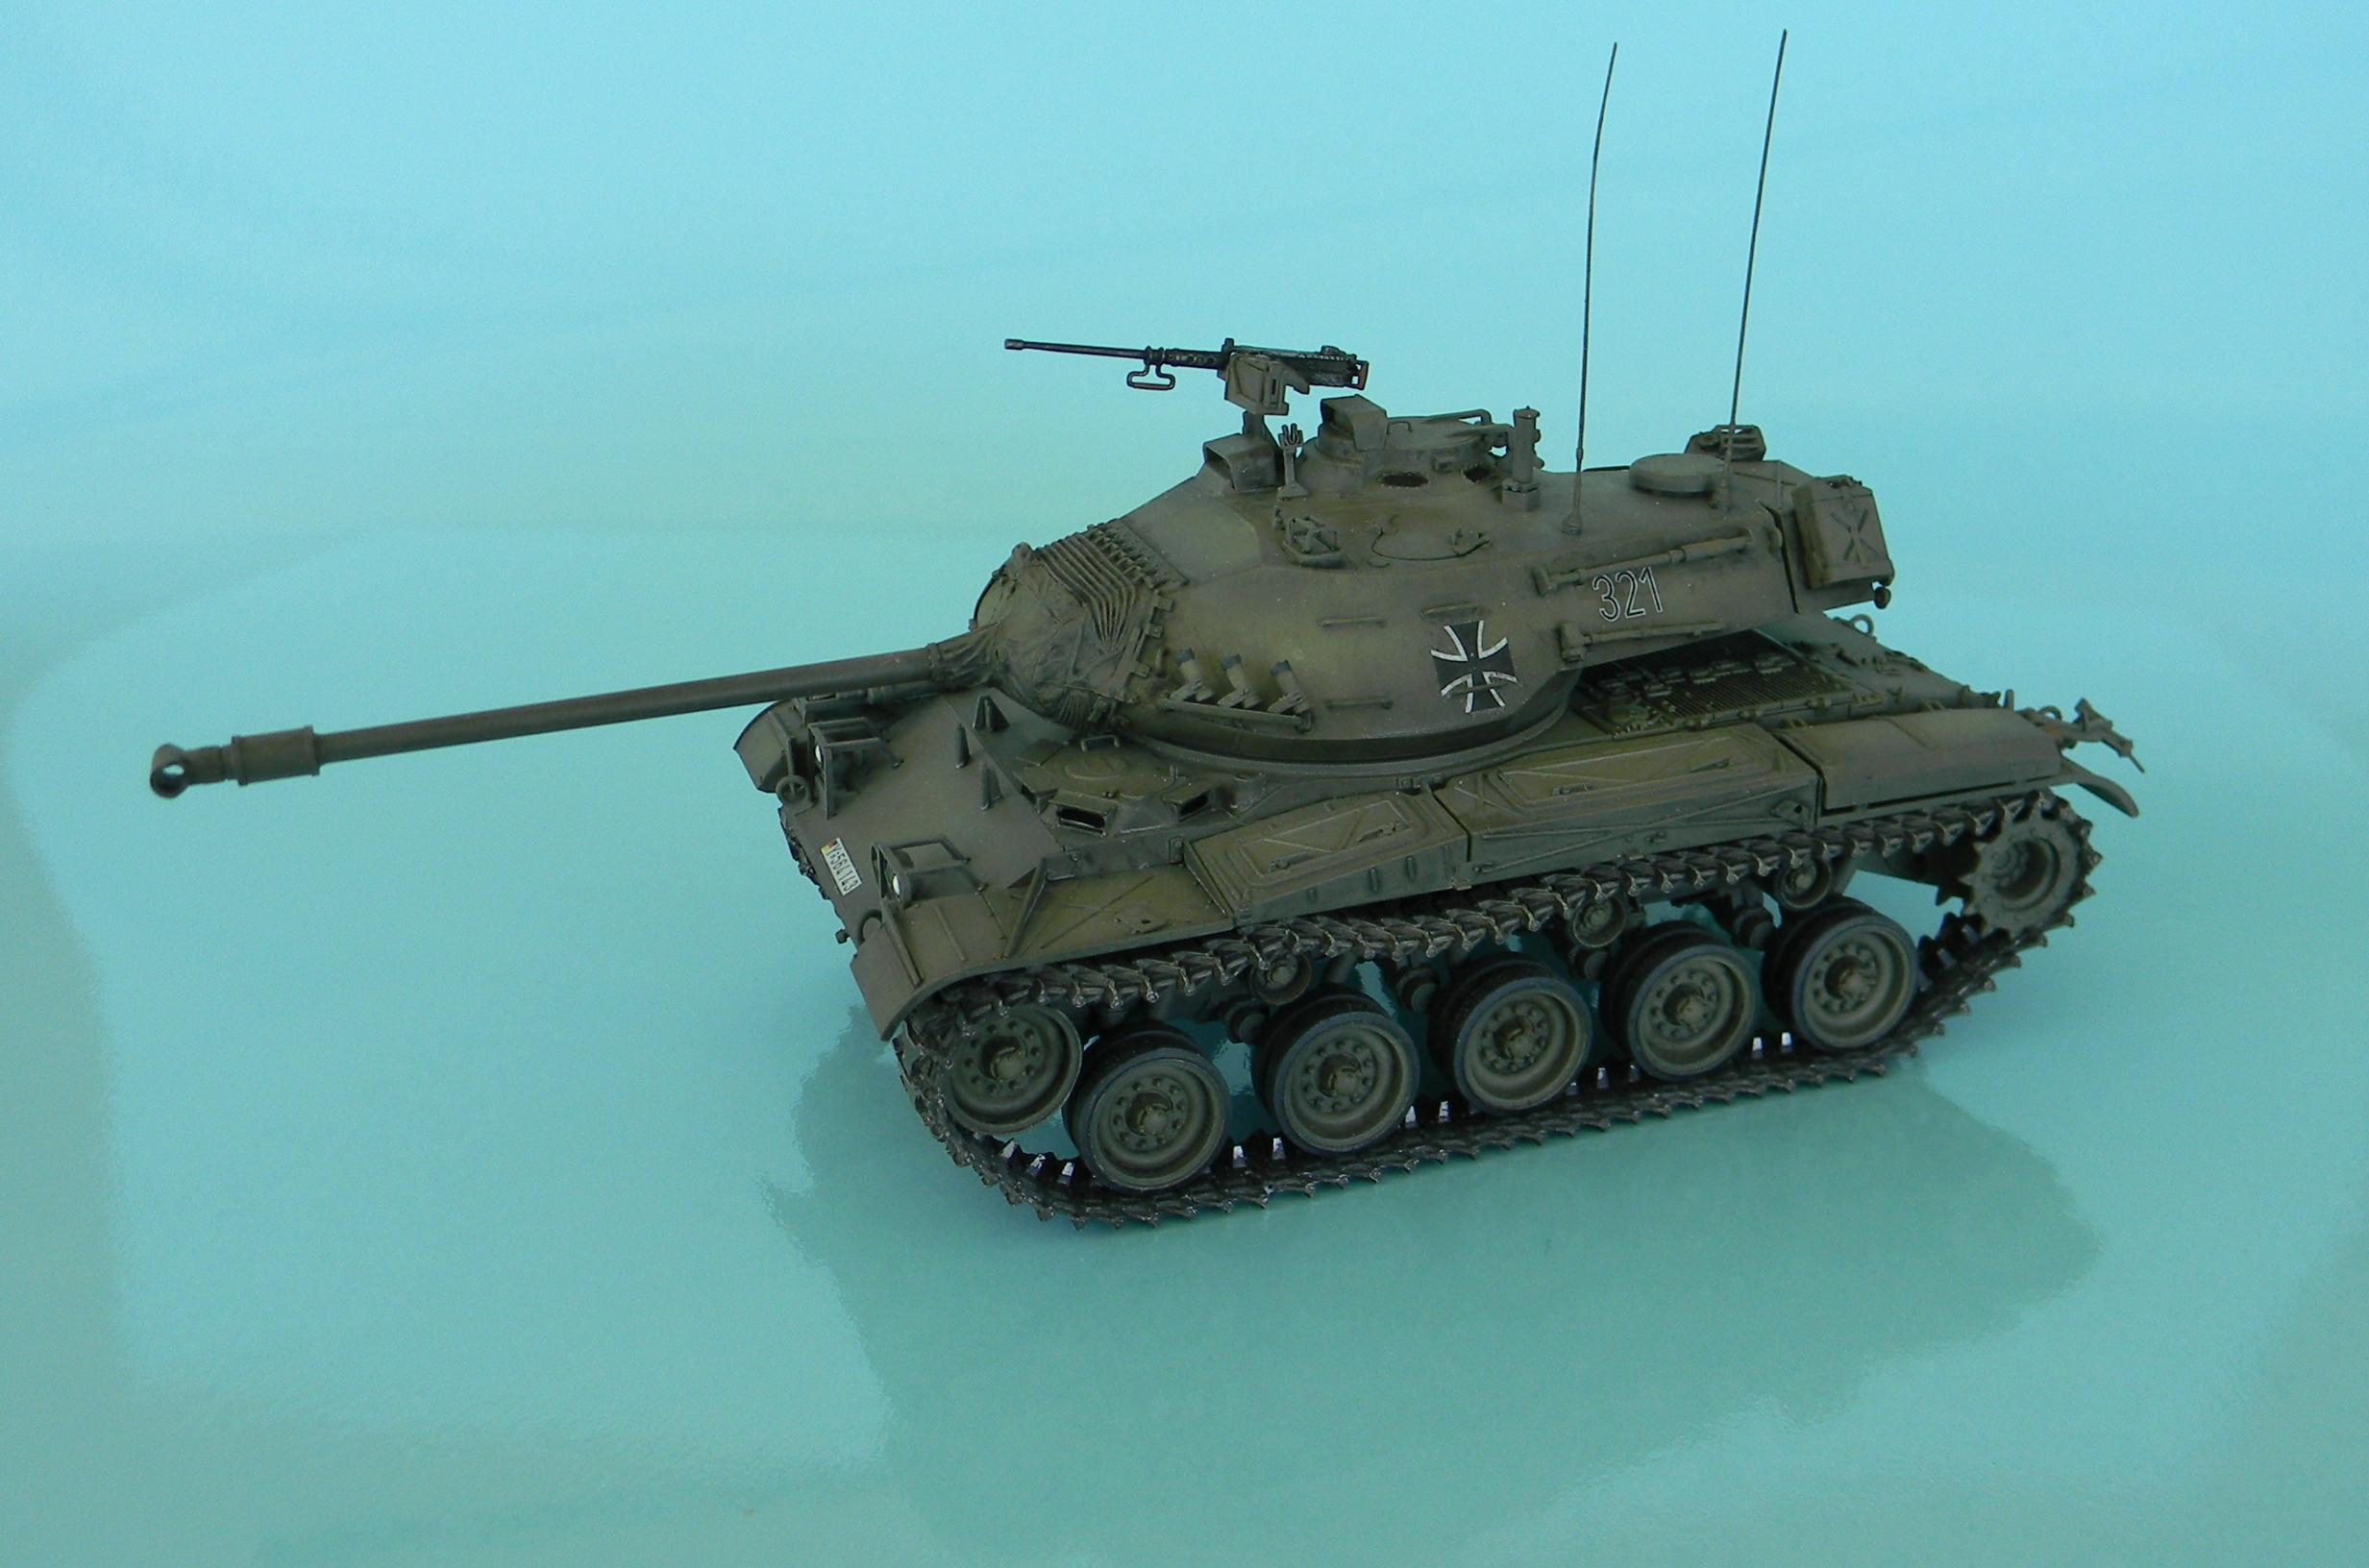 Tamiya M41 Walker Bulldog